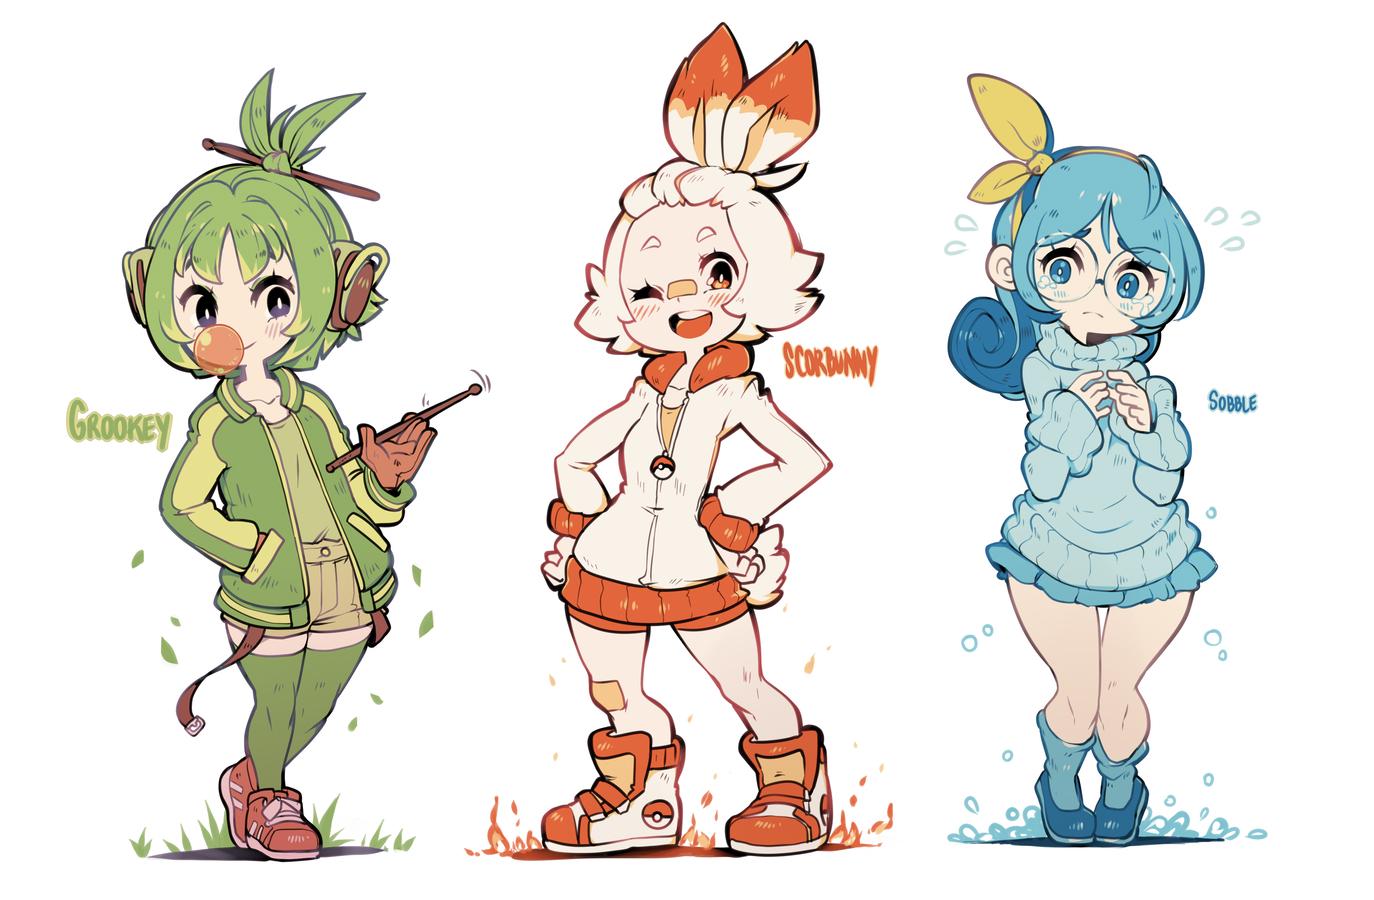 Pokemon SS - 3 Starters Gijinkas